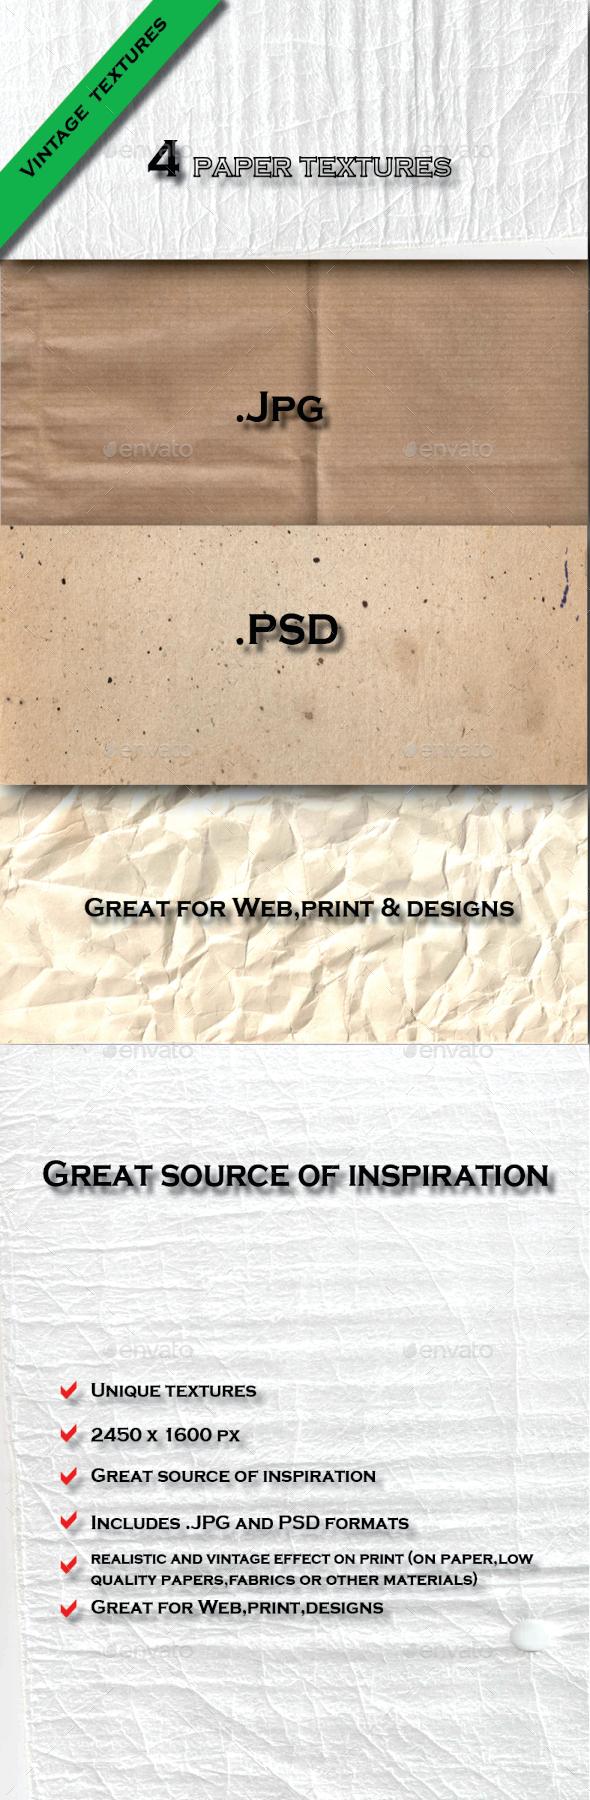 GraphicRiver 4 Vintage Paper Textures Pack 6585750